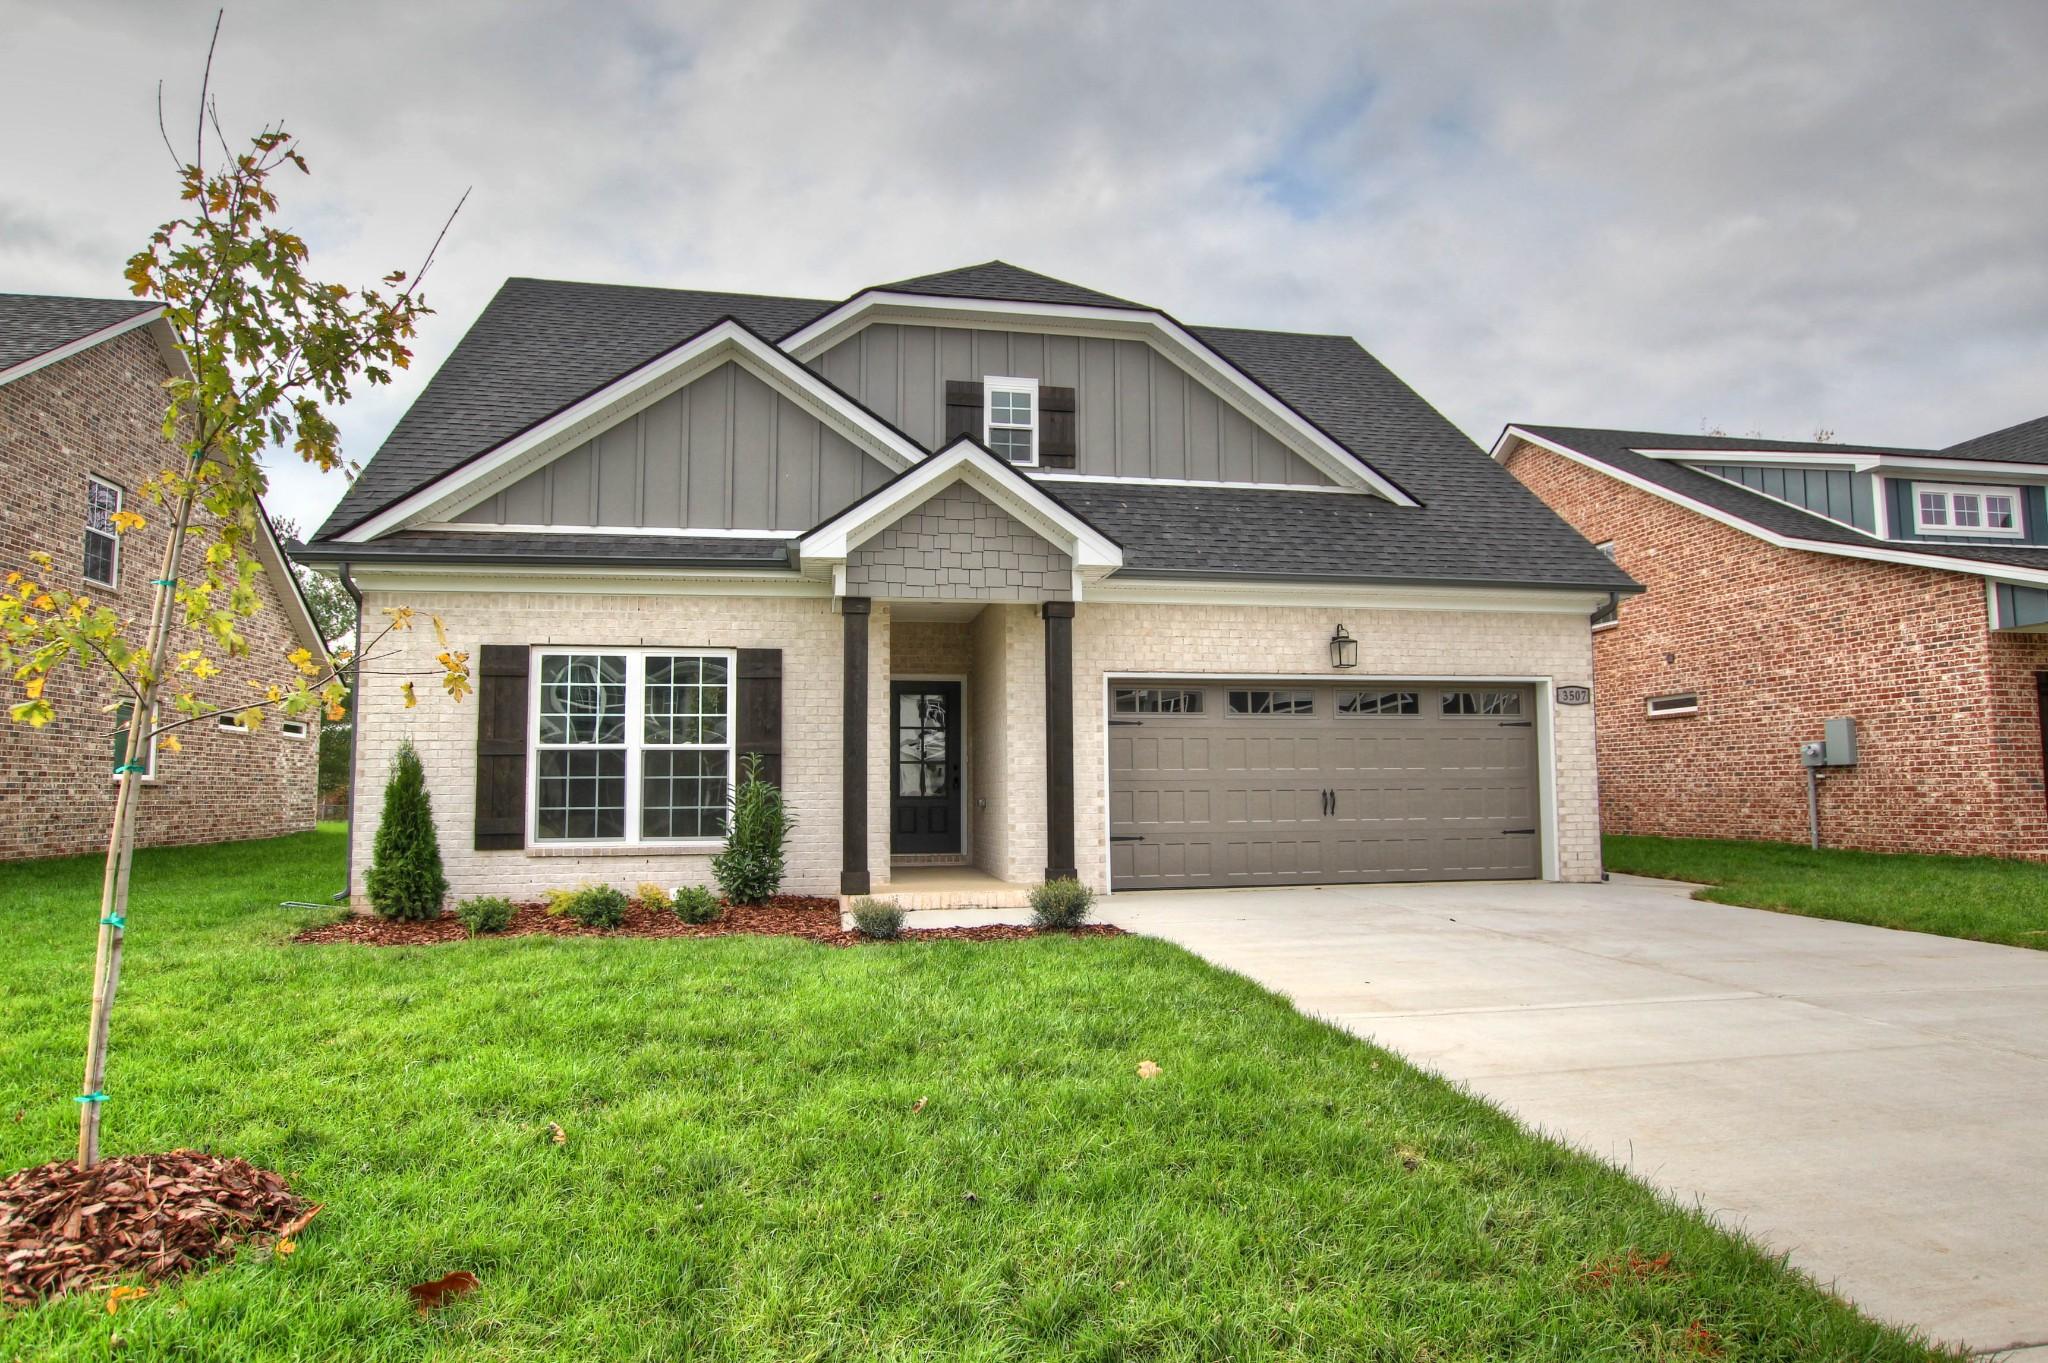 3507 Pershing Dr.- Lot 10, Murfreesboro, TN 37129 - Murfreesboro, TN real estate listing